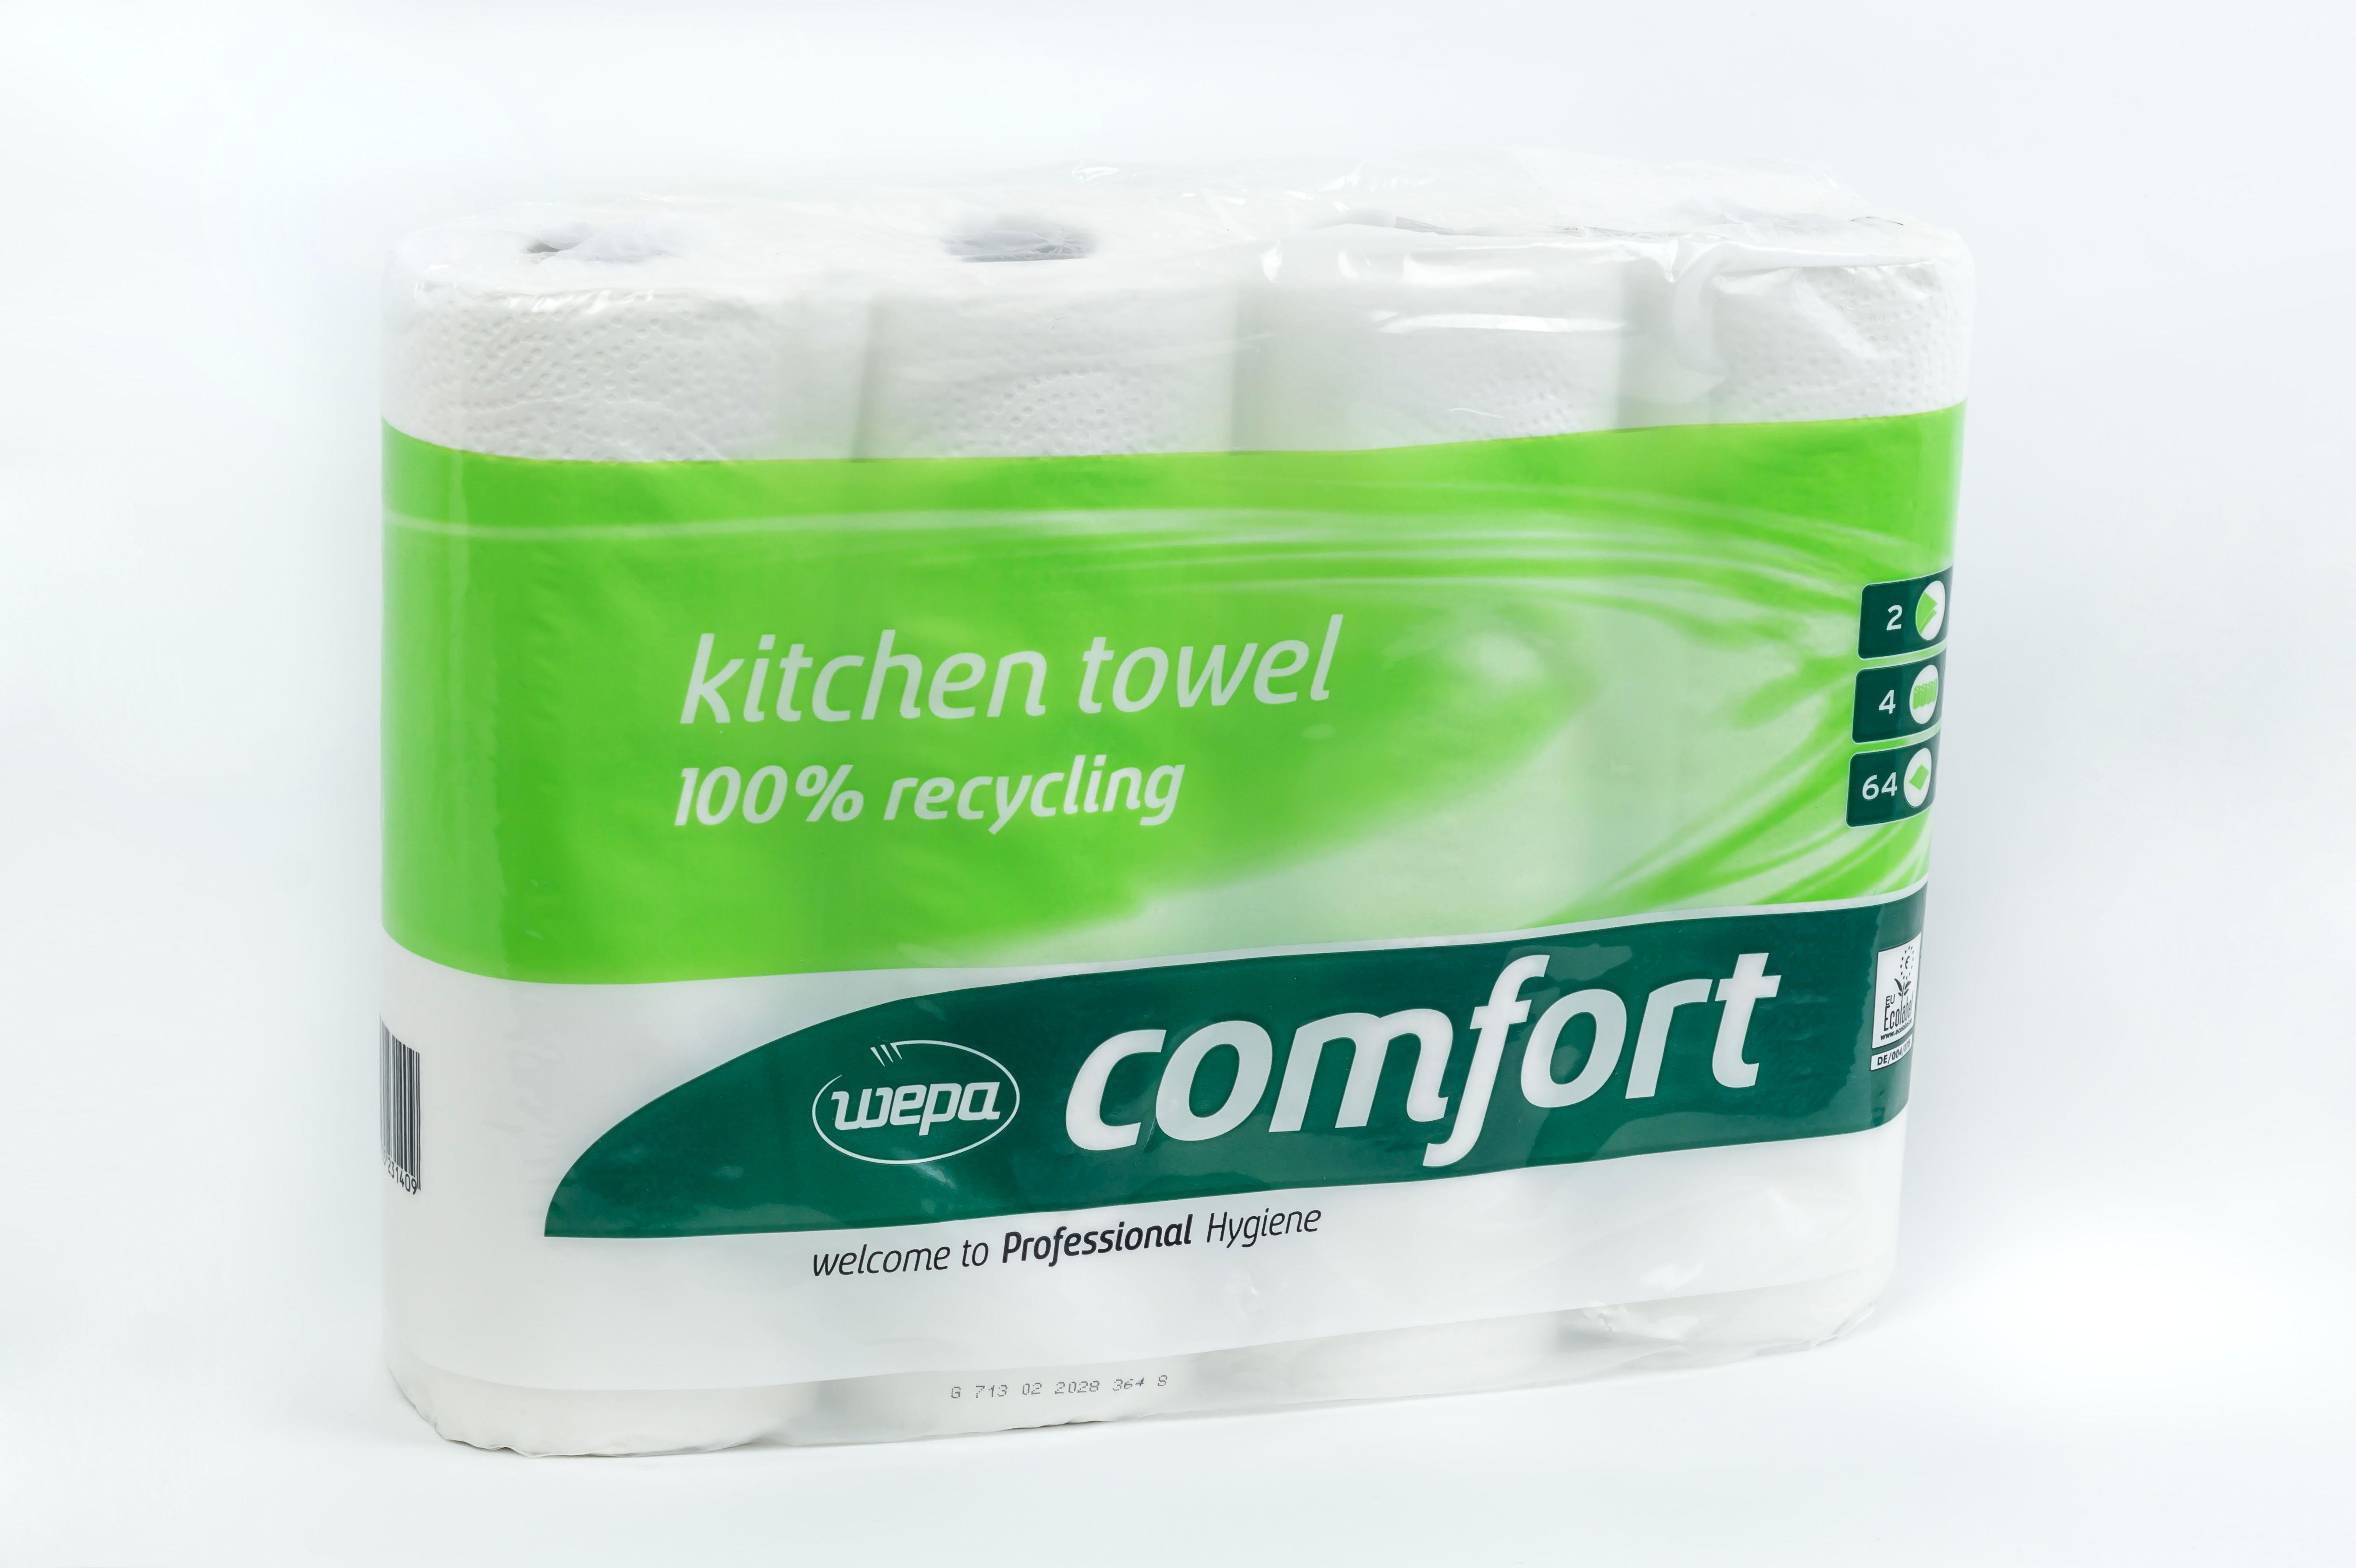 Küchentücher, Küchenrolle Wepa Comfort 2-lagig | 100% Recycling | 4 Rollen